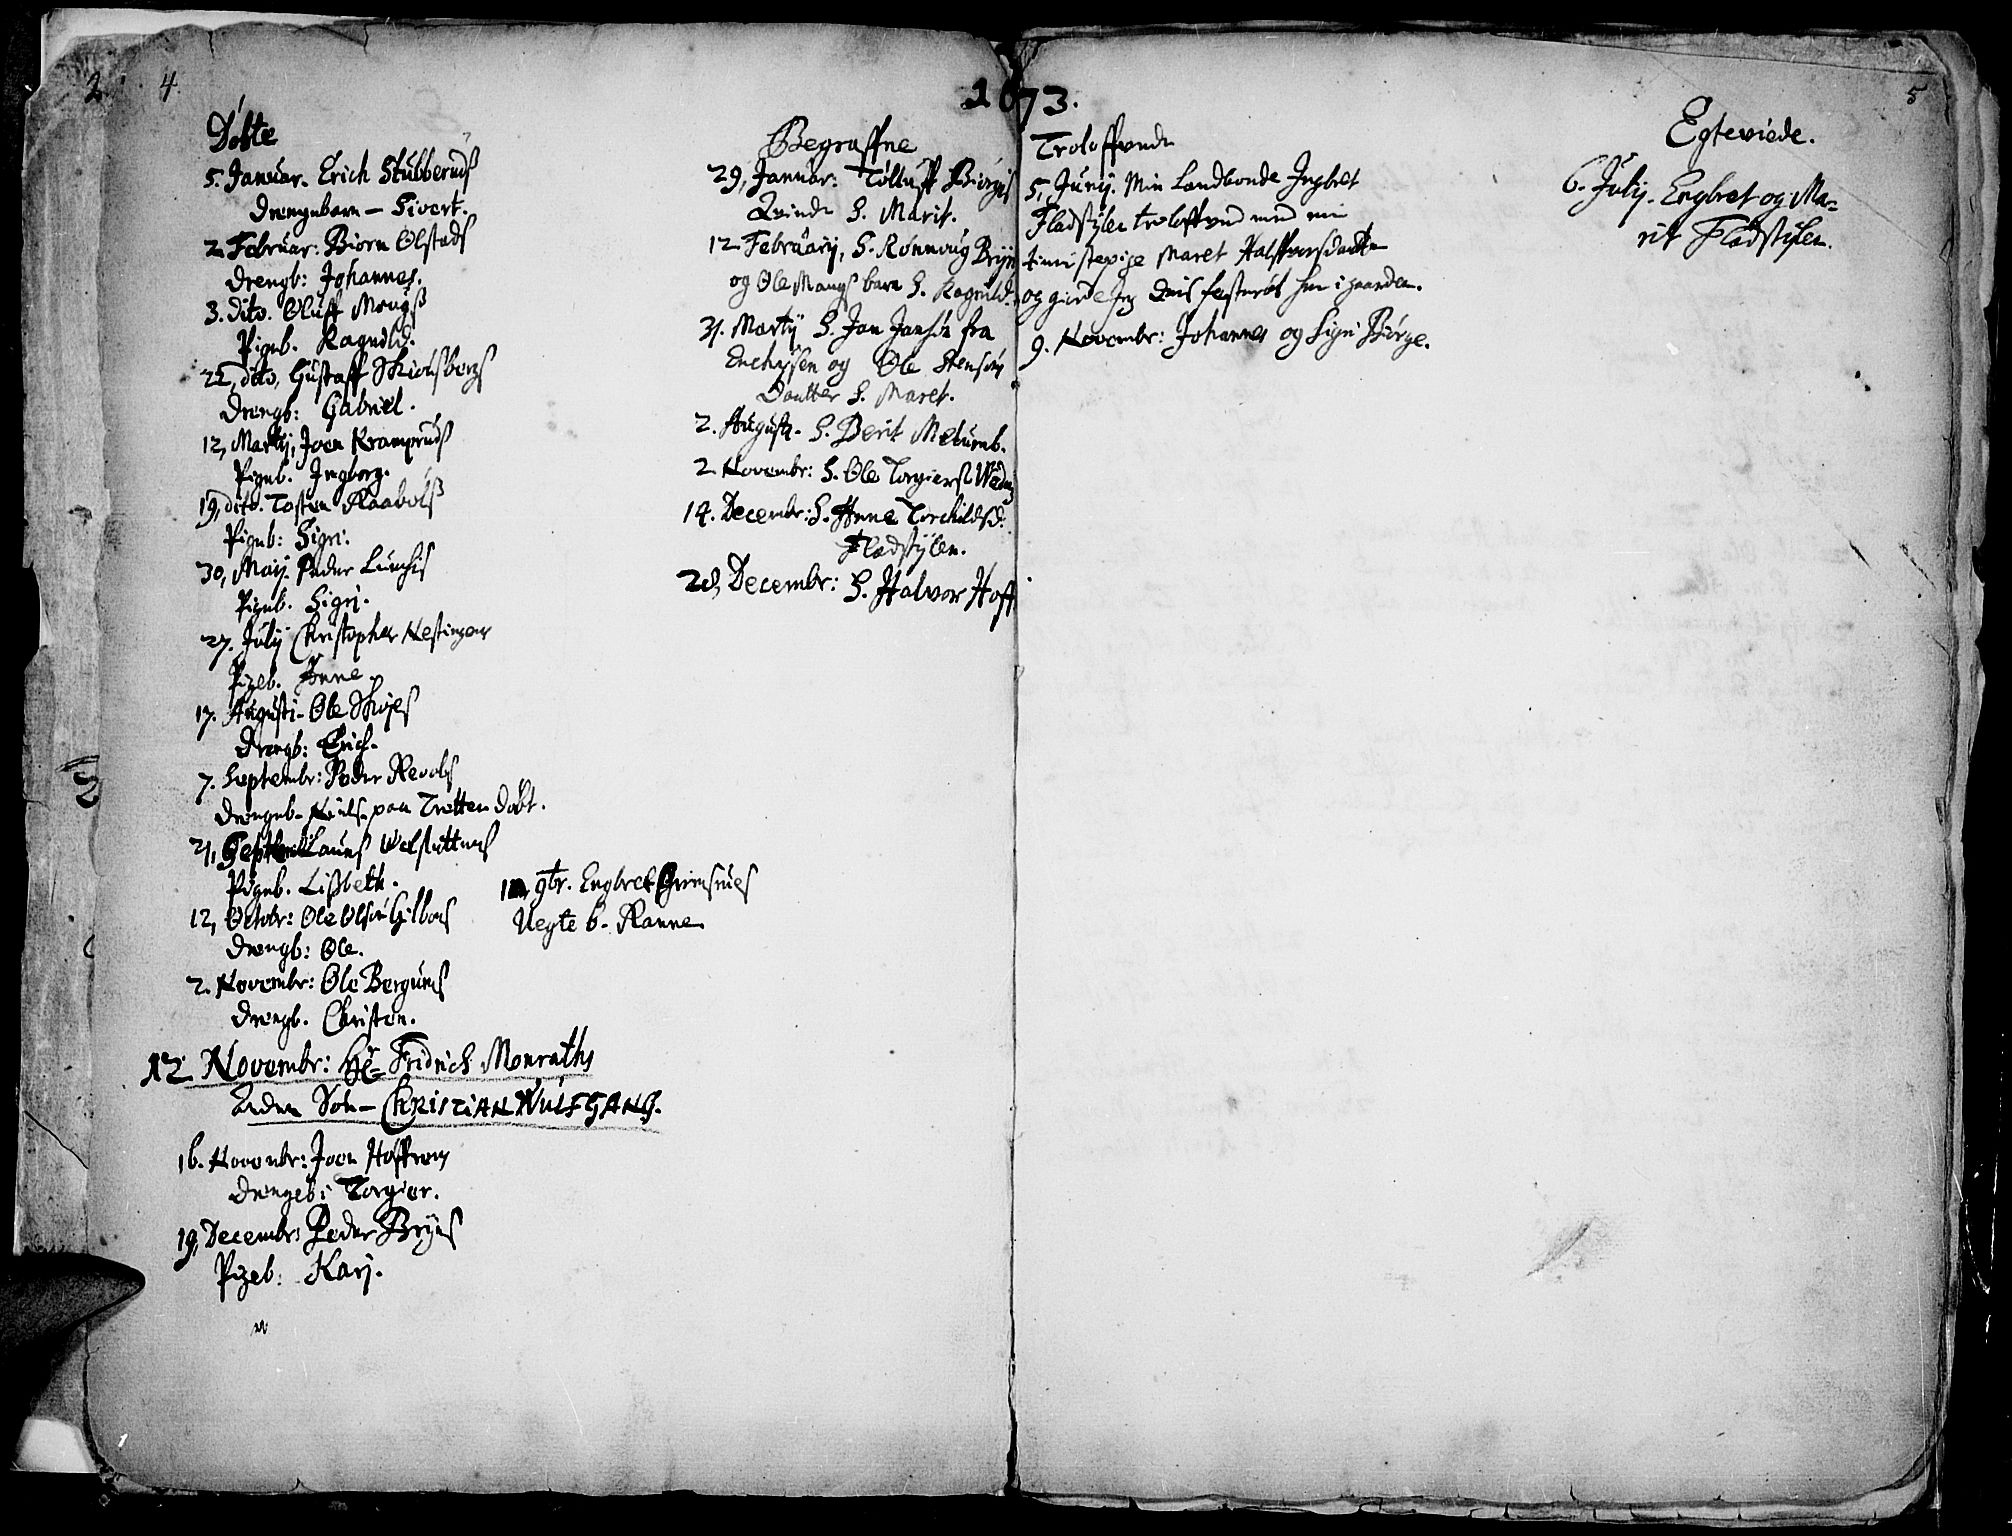 SAH, Øyer prestekontor, Ministerialbok nr. 1, 1671-1727, s. 4-5